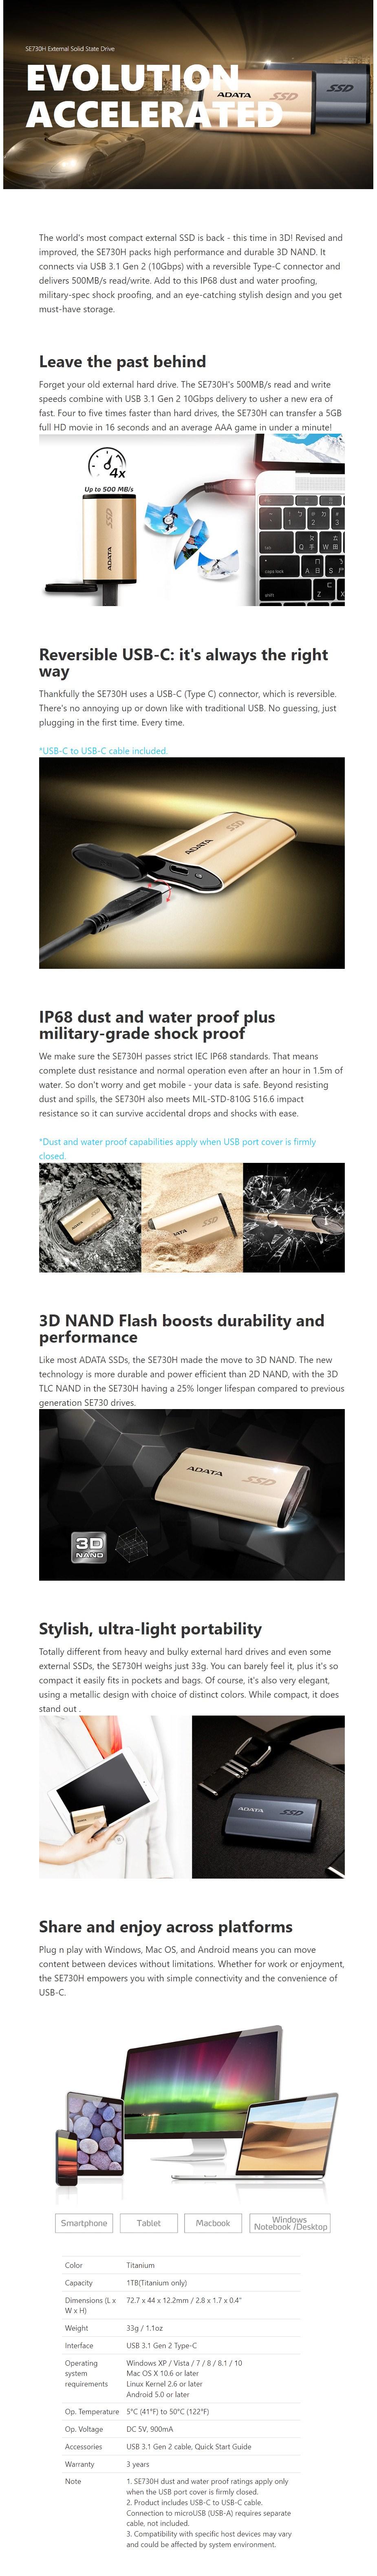 Adata SE730H 1TB USB 3.1 Type-C Portable External SSD Hard Drive - Titanium  - Overview 1